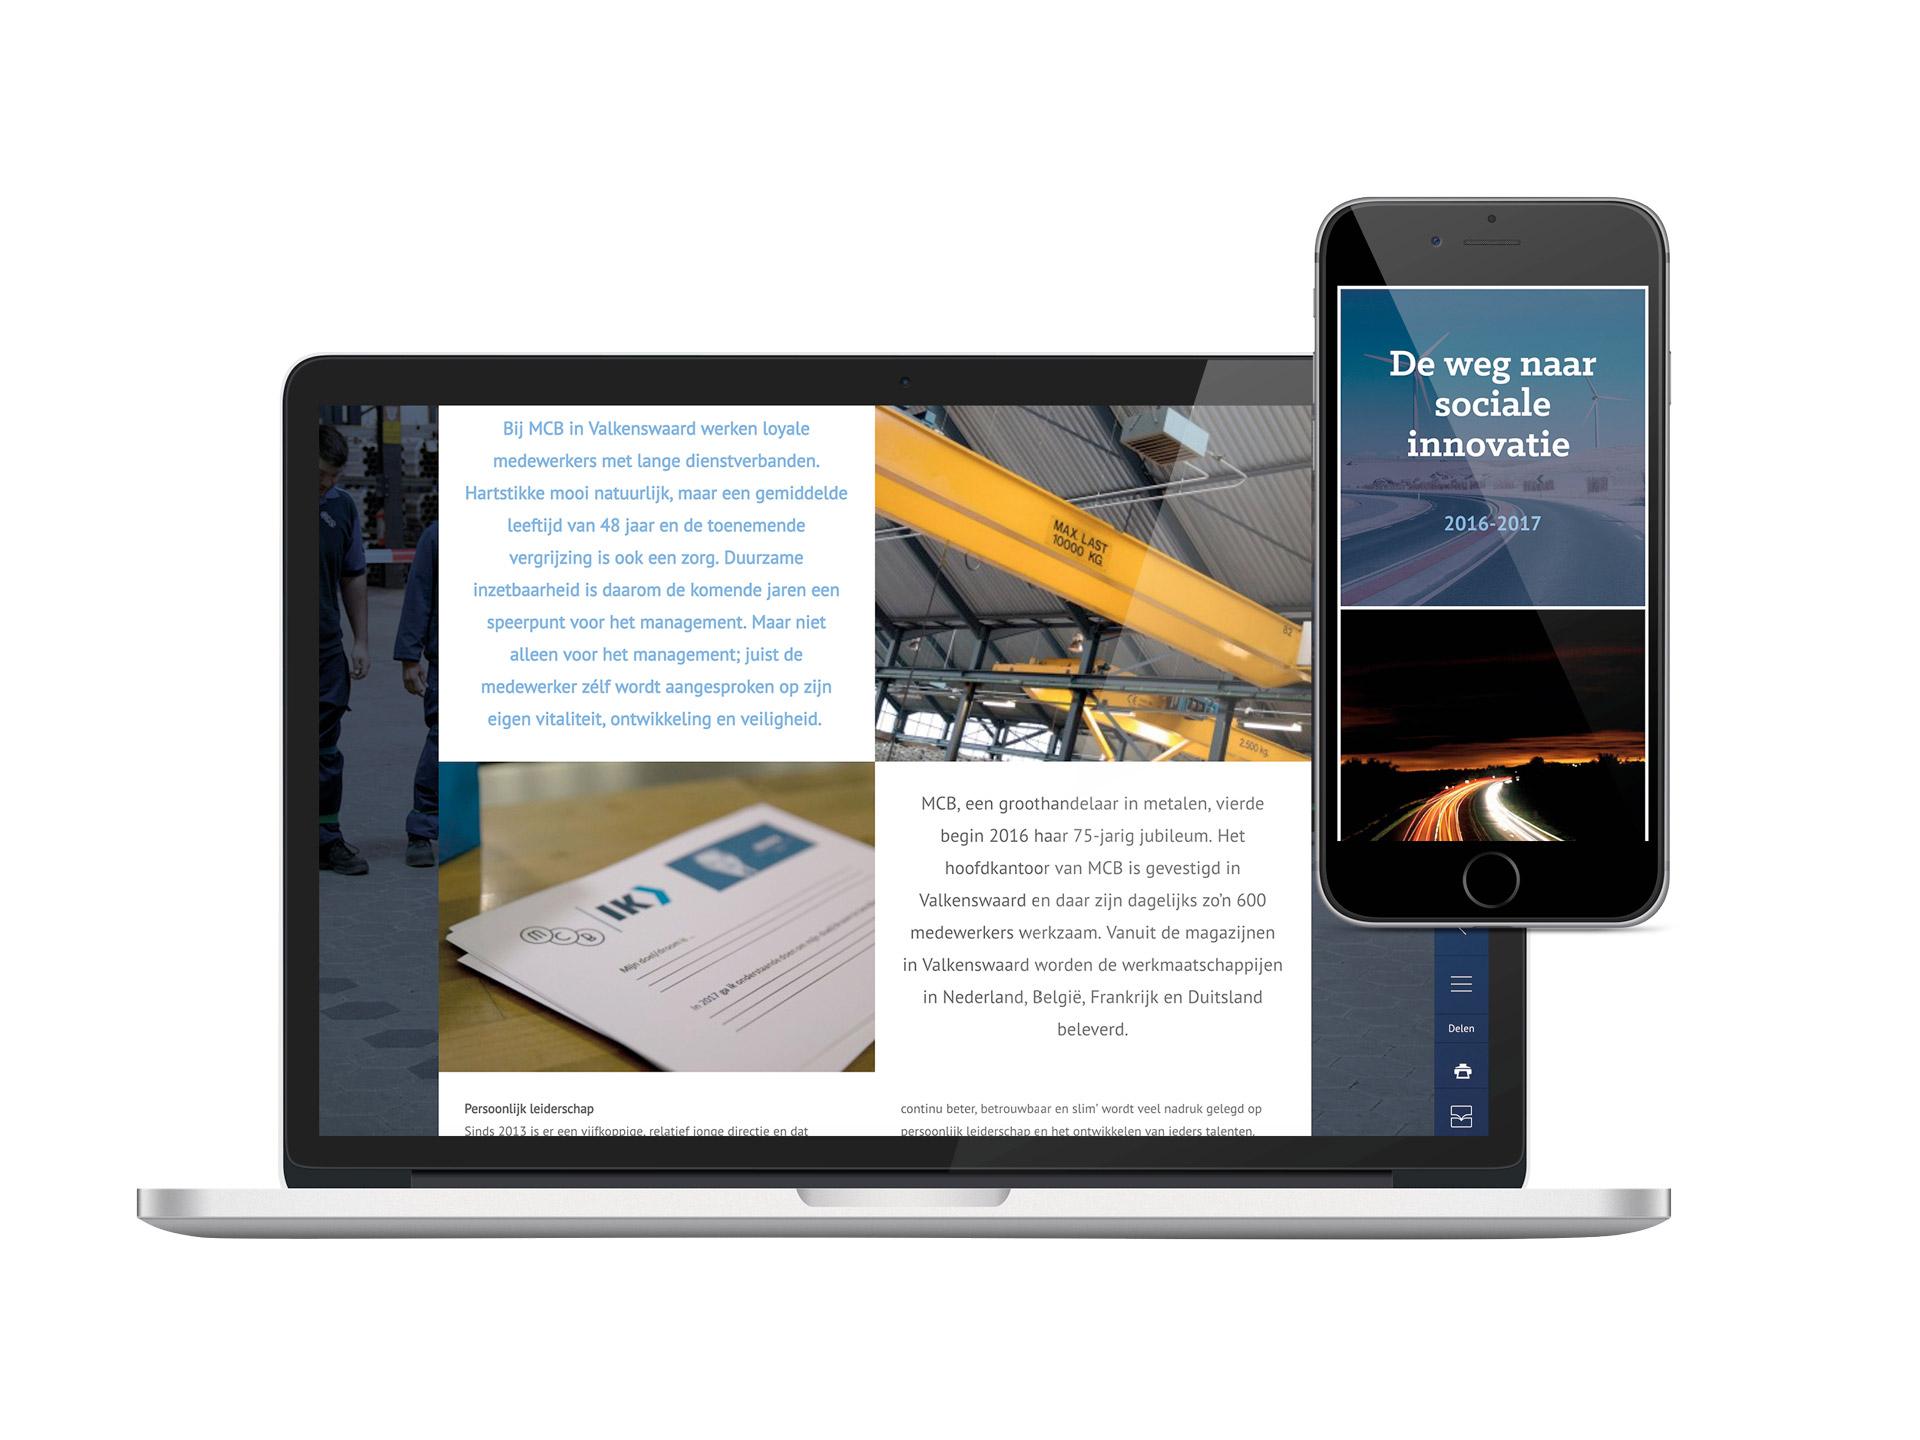 Topsector Logistiek online magazine